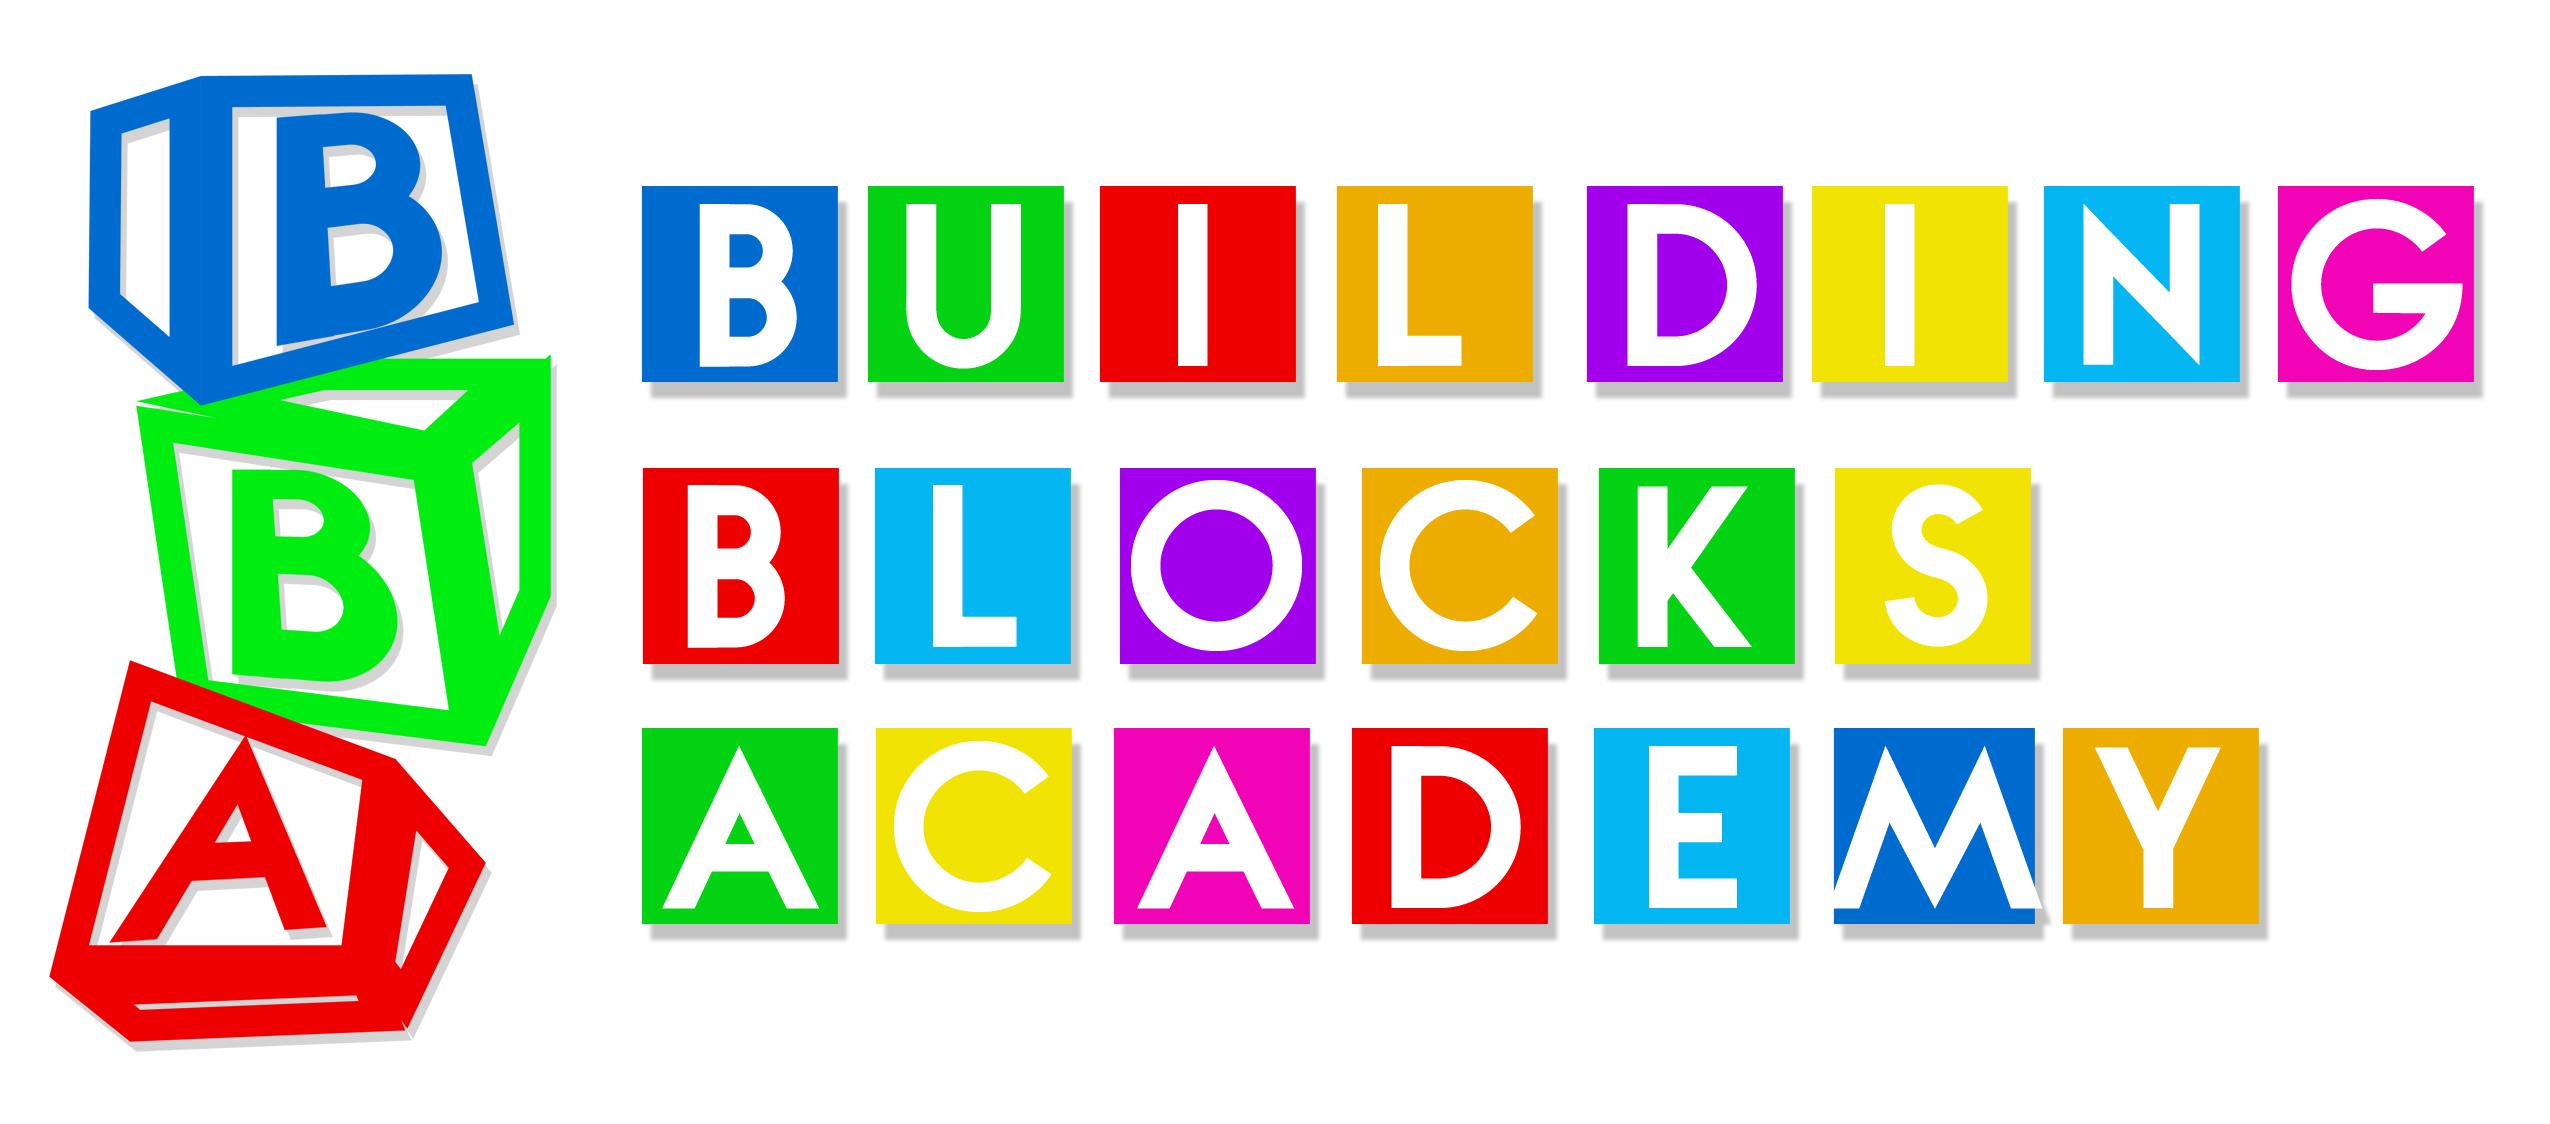 Building Blocks Academy - Logo